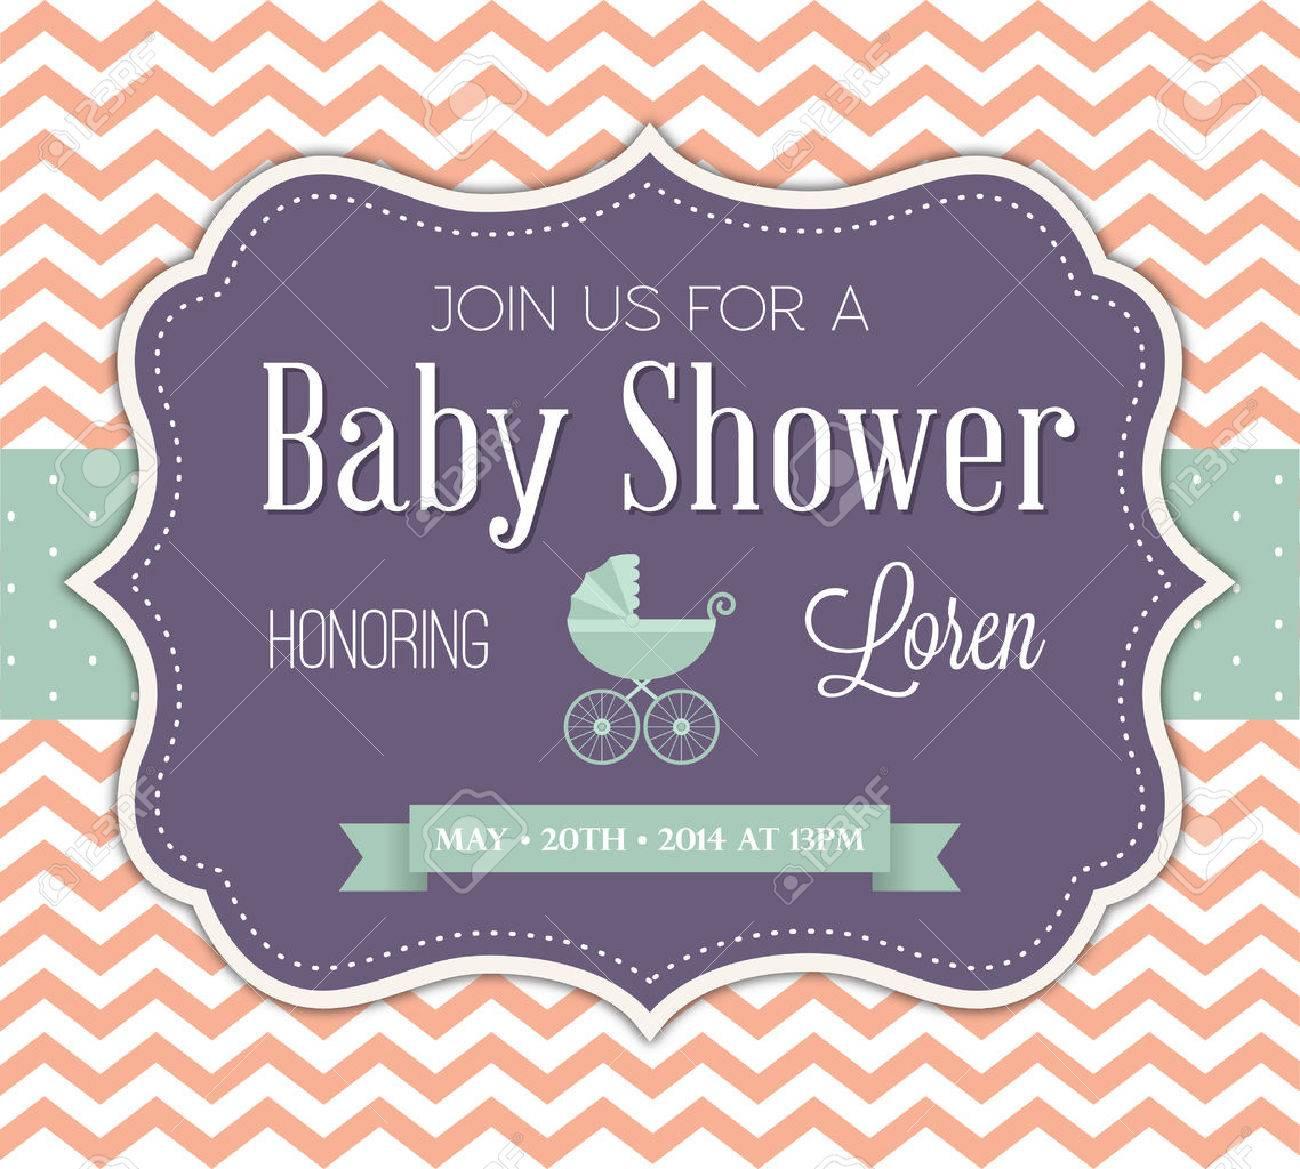 Baby Shower Invitation Stock Vector - 41866466